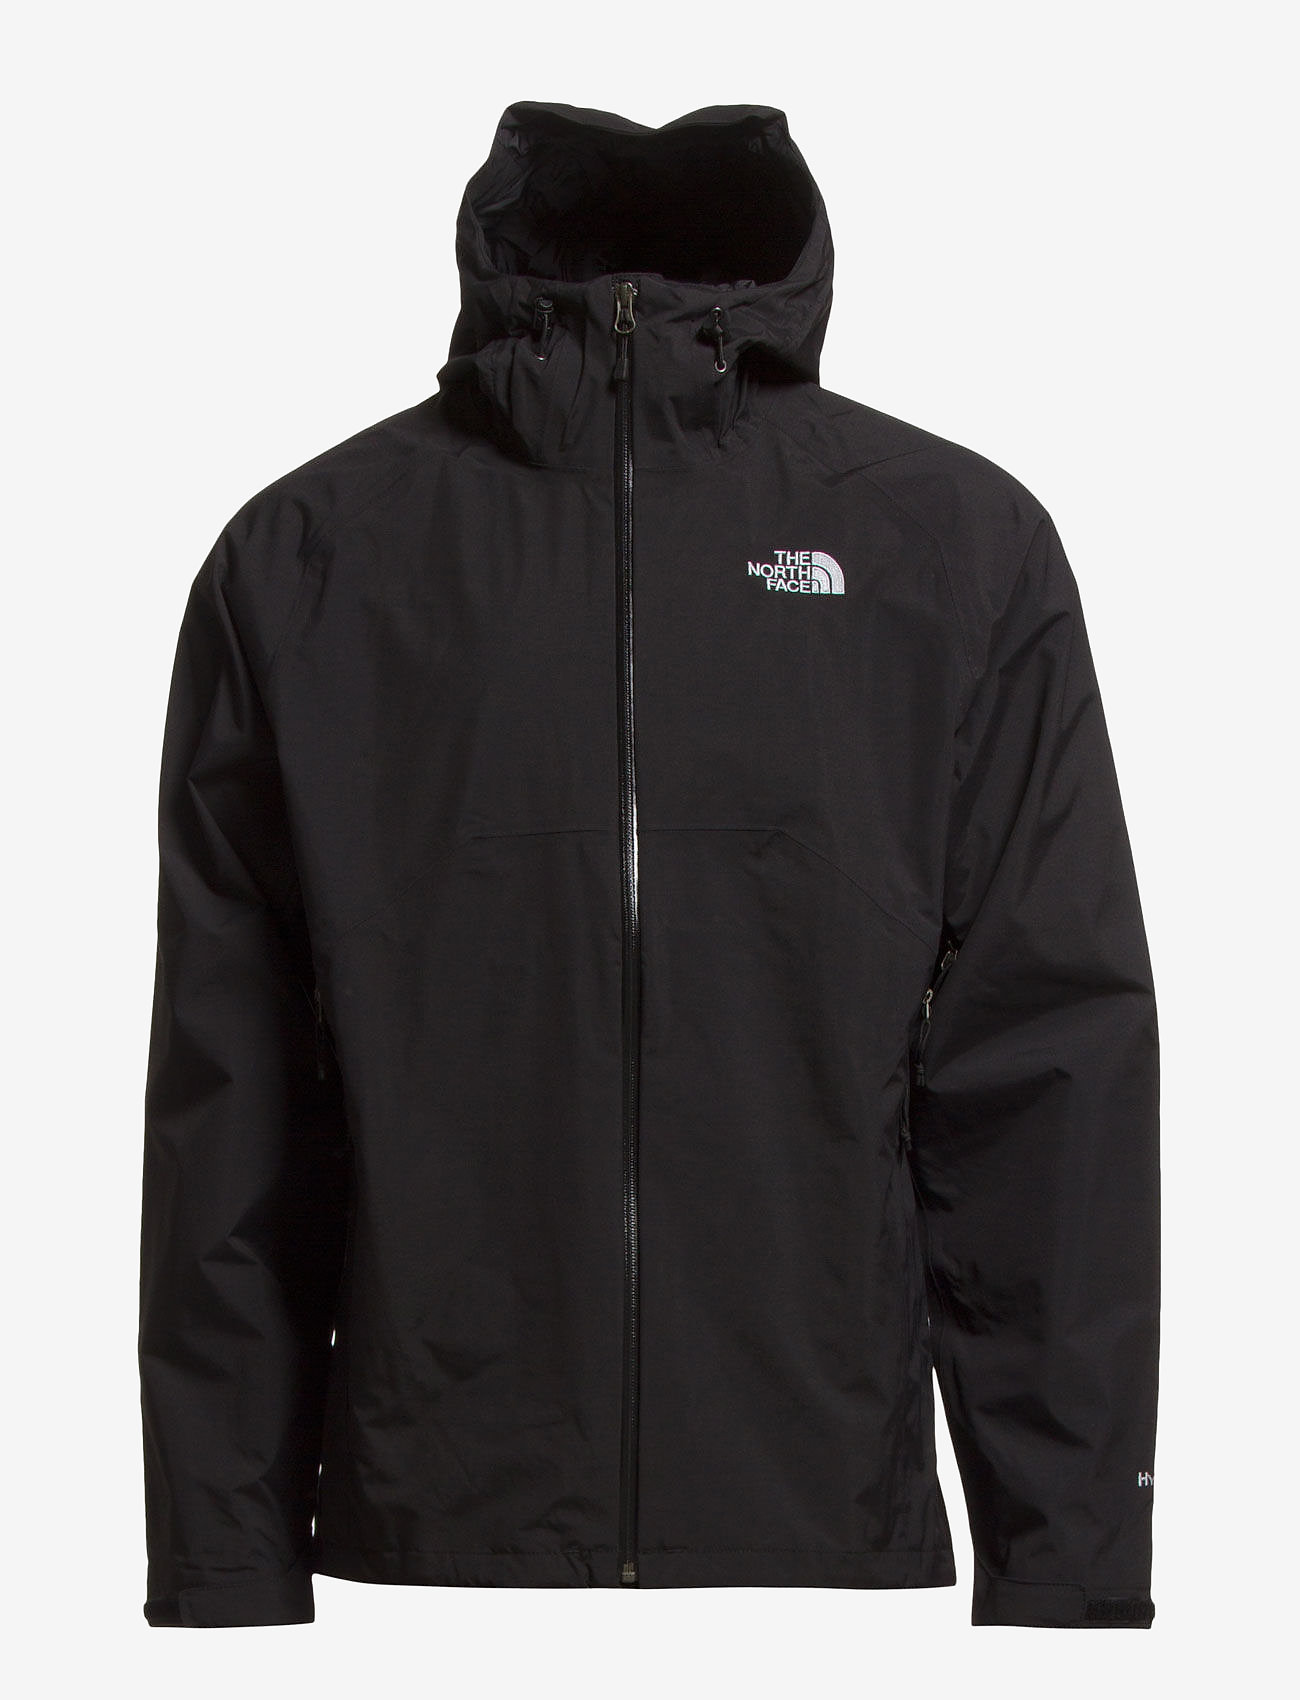 The North Face - M STRATOS JACKET - kurtki turystyczne - tnf black - 0